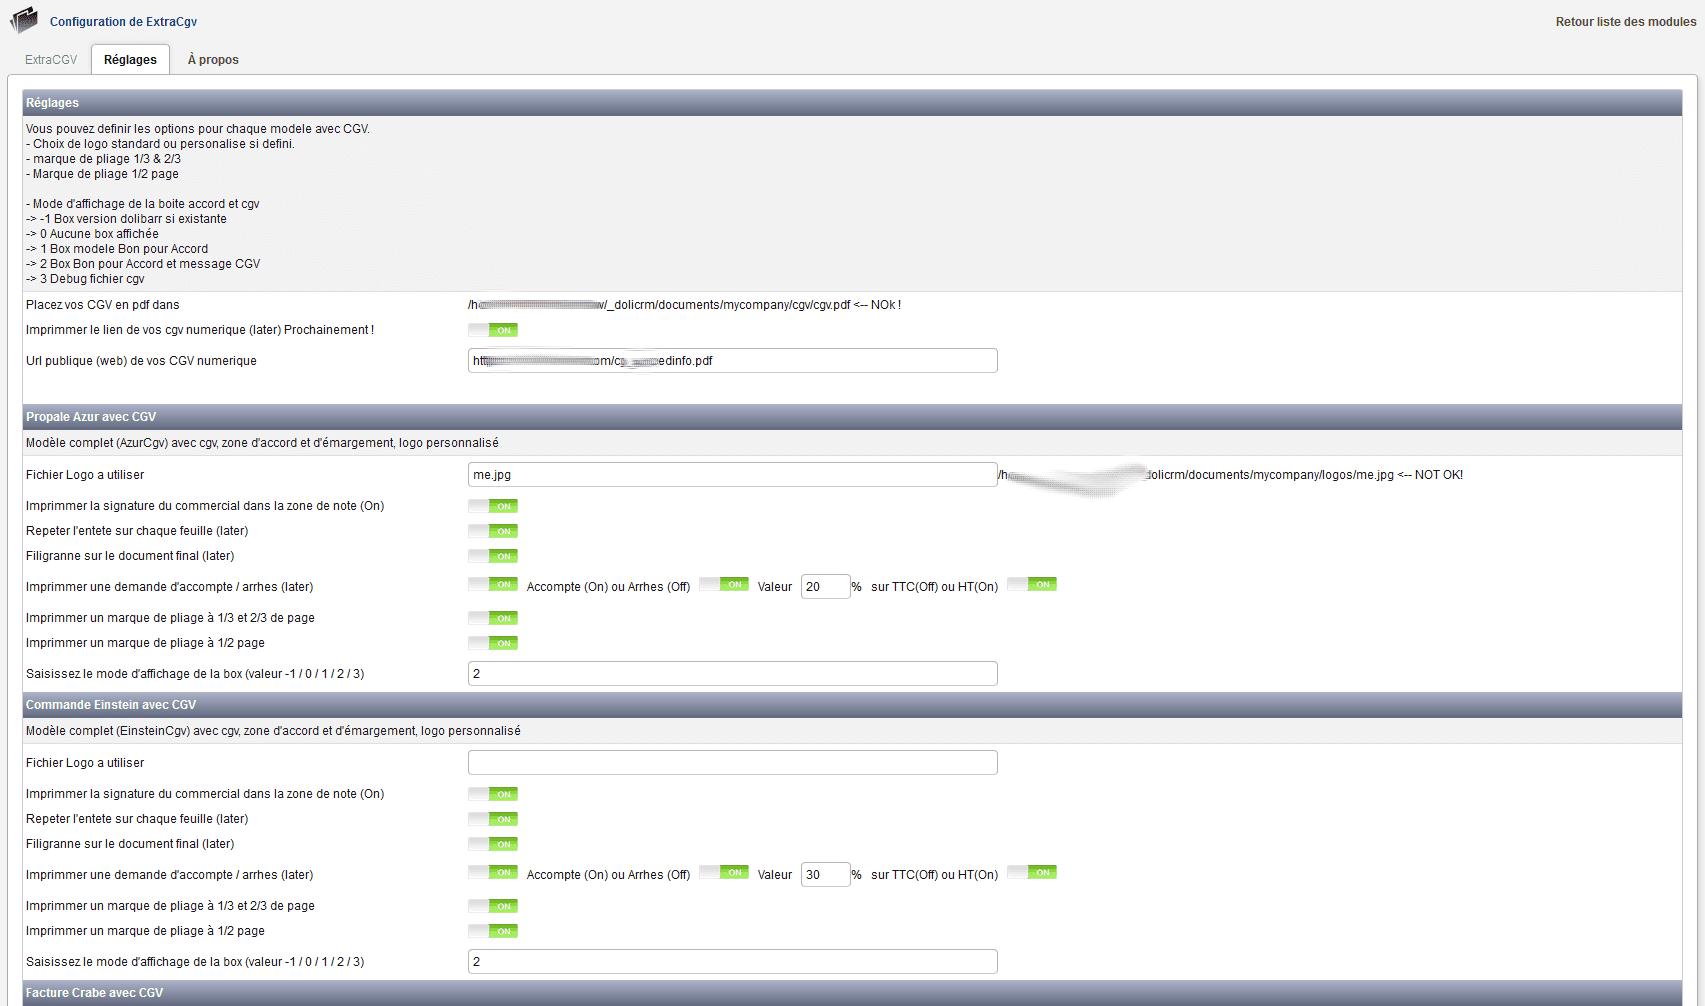 module_extracgv_setup_3.8.4.v1.02-propale